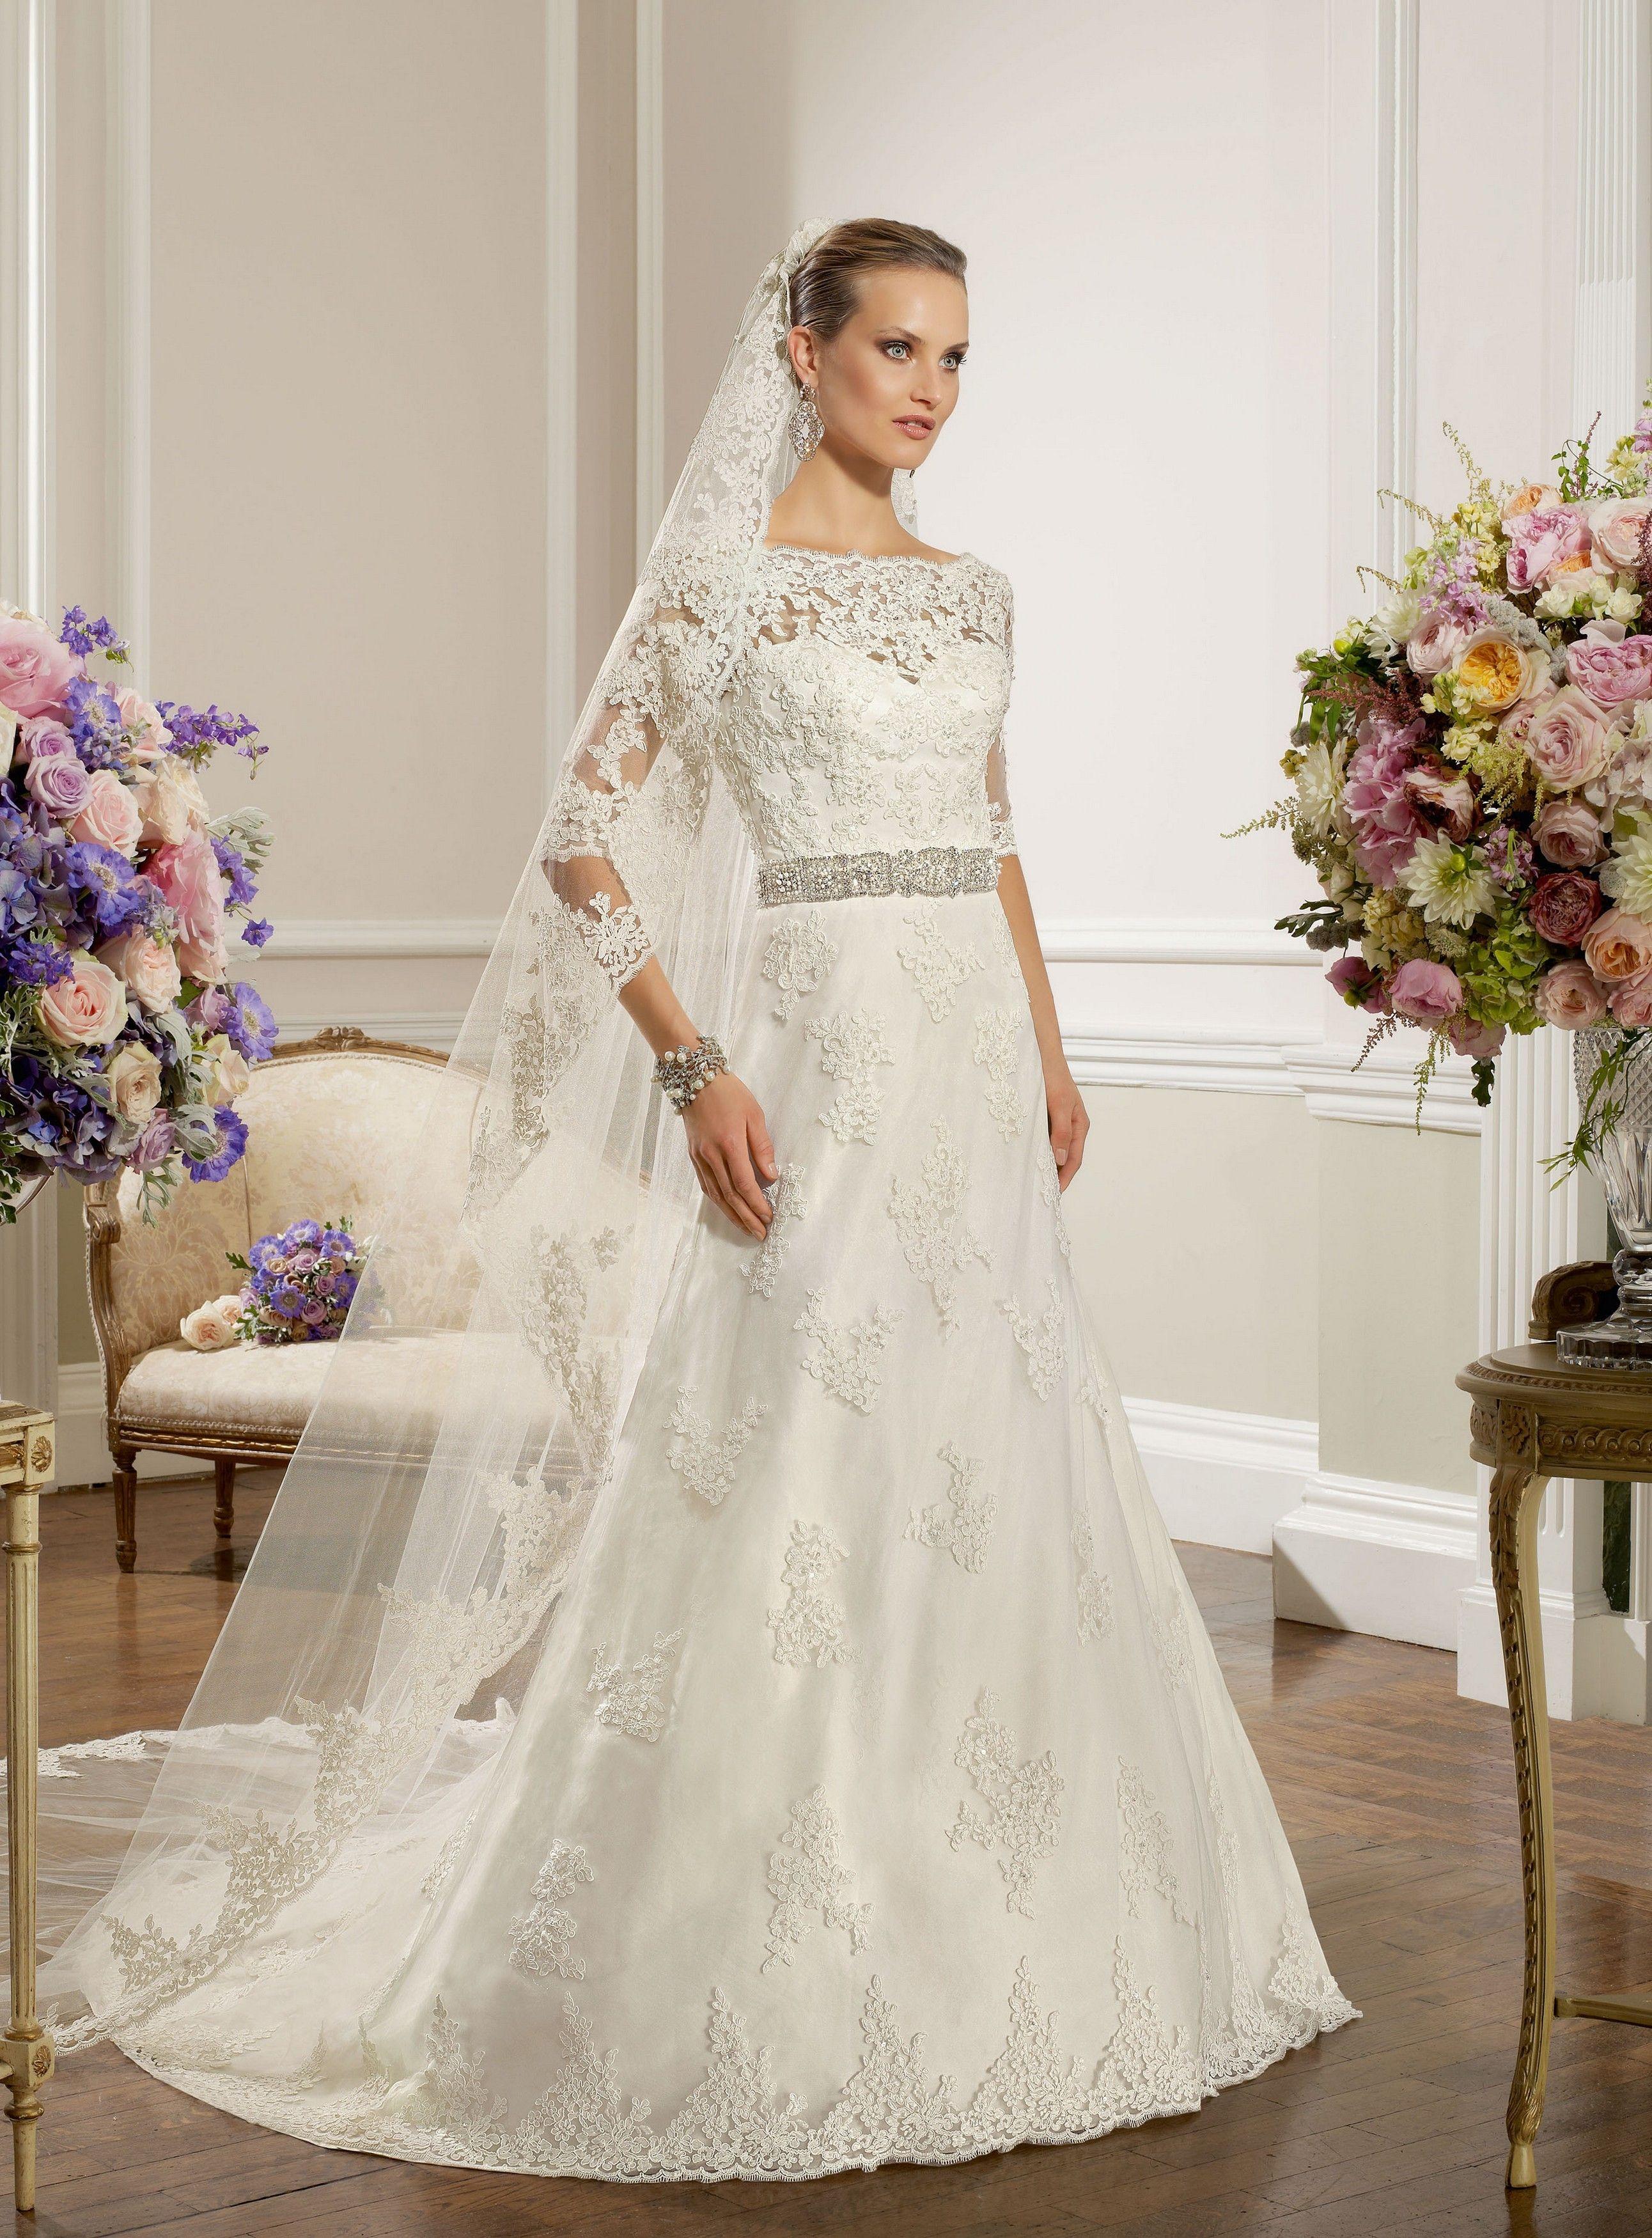 Pin by jenny rooney on wedding dress pinterest ronald joyce